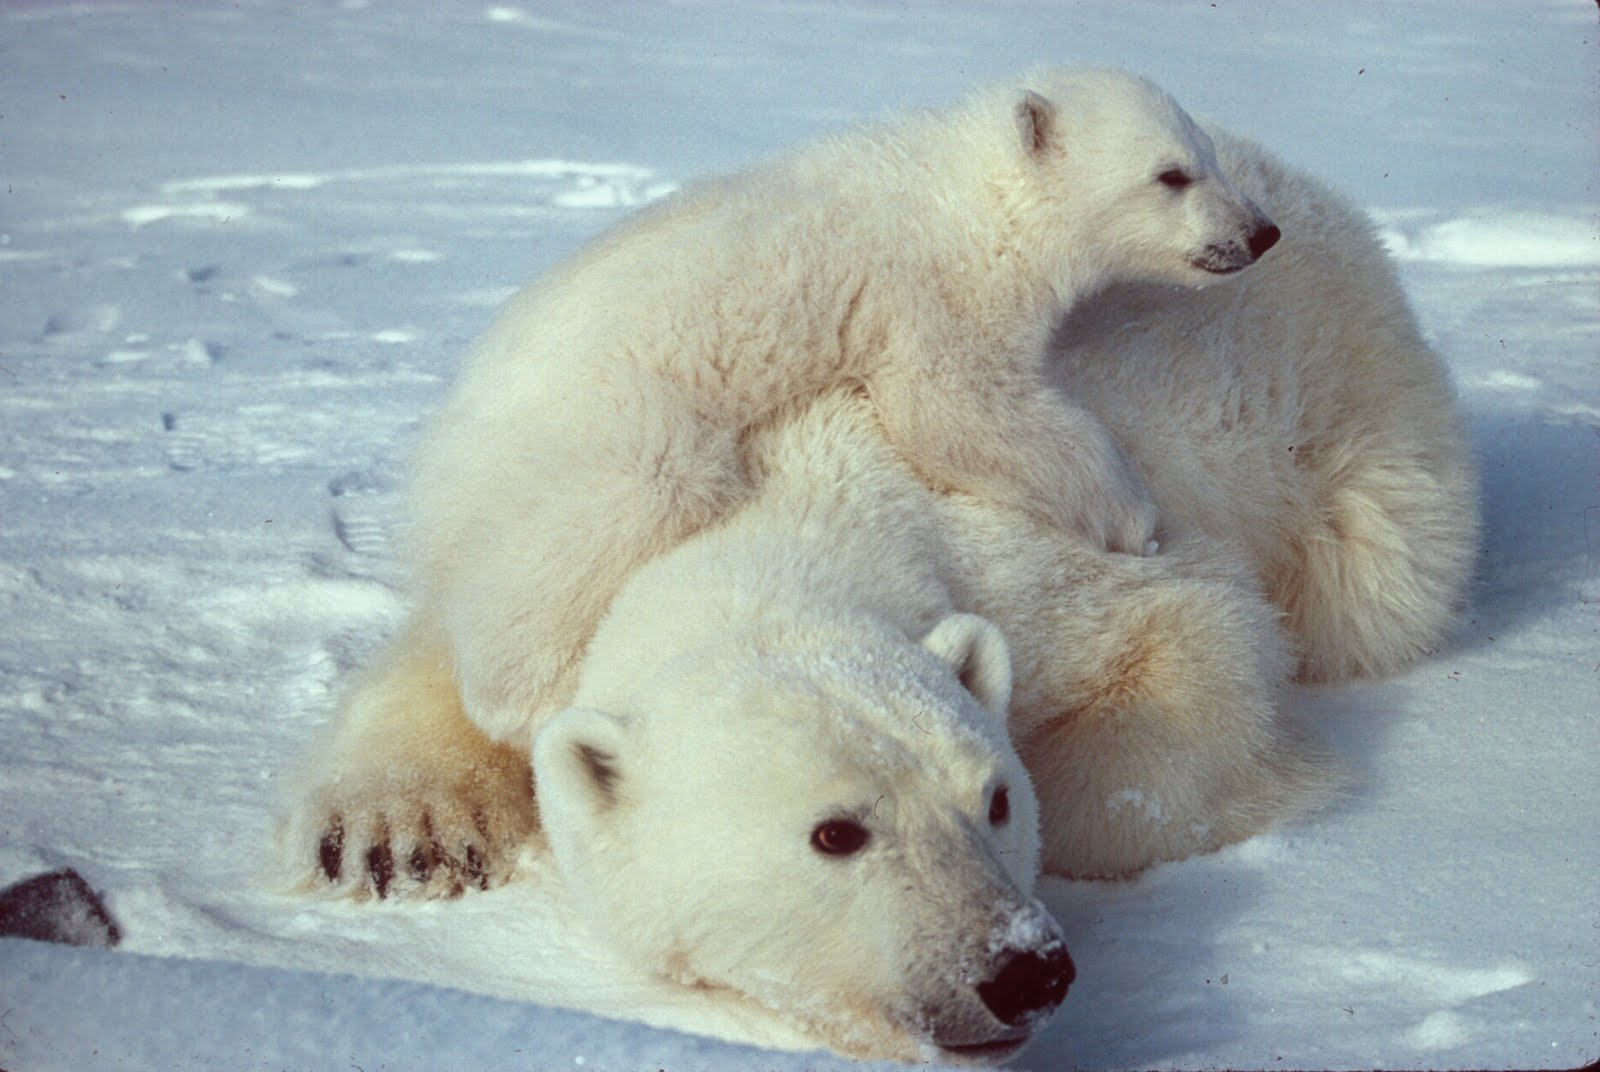 http://4.bp.blogspot.com/-aWoaN8x4VHk/T1hPO7eSU9I/AAAAAAAAERY/Nh5XUbceECs/s1600/Ursus_maritimus_Polar_bear_with_cub_2.jpg